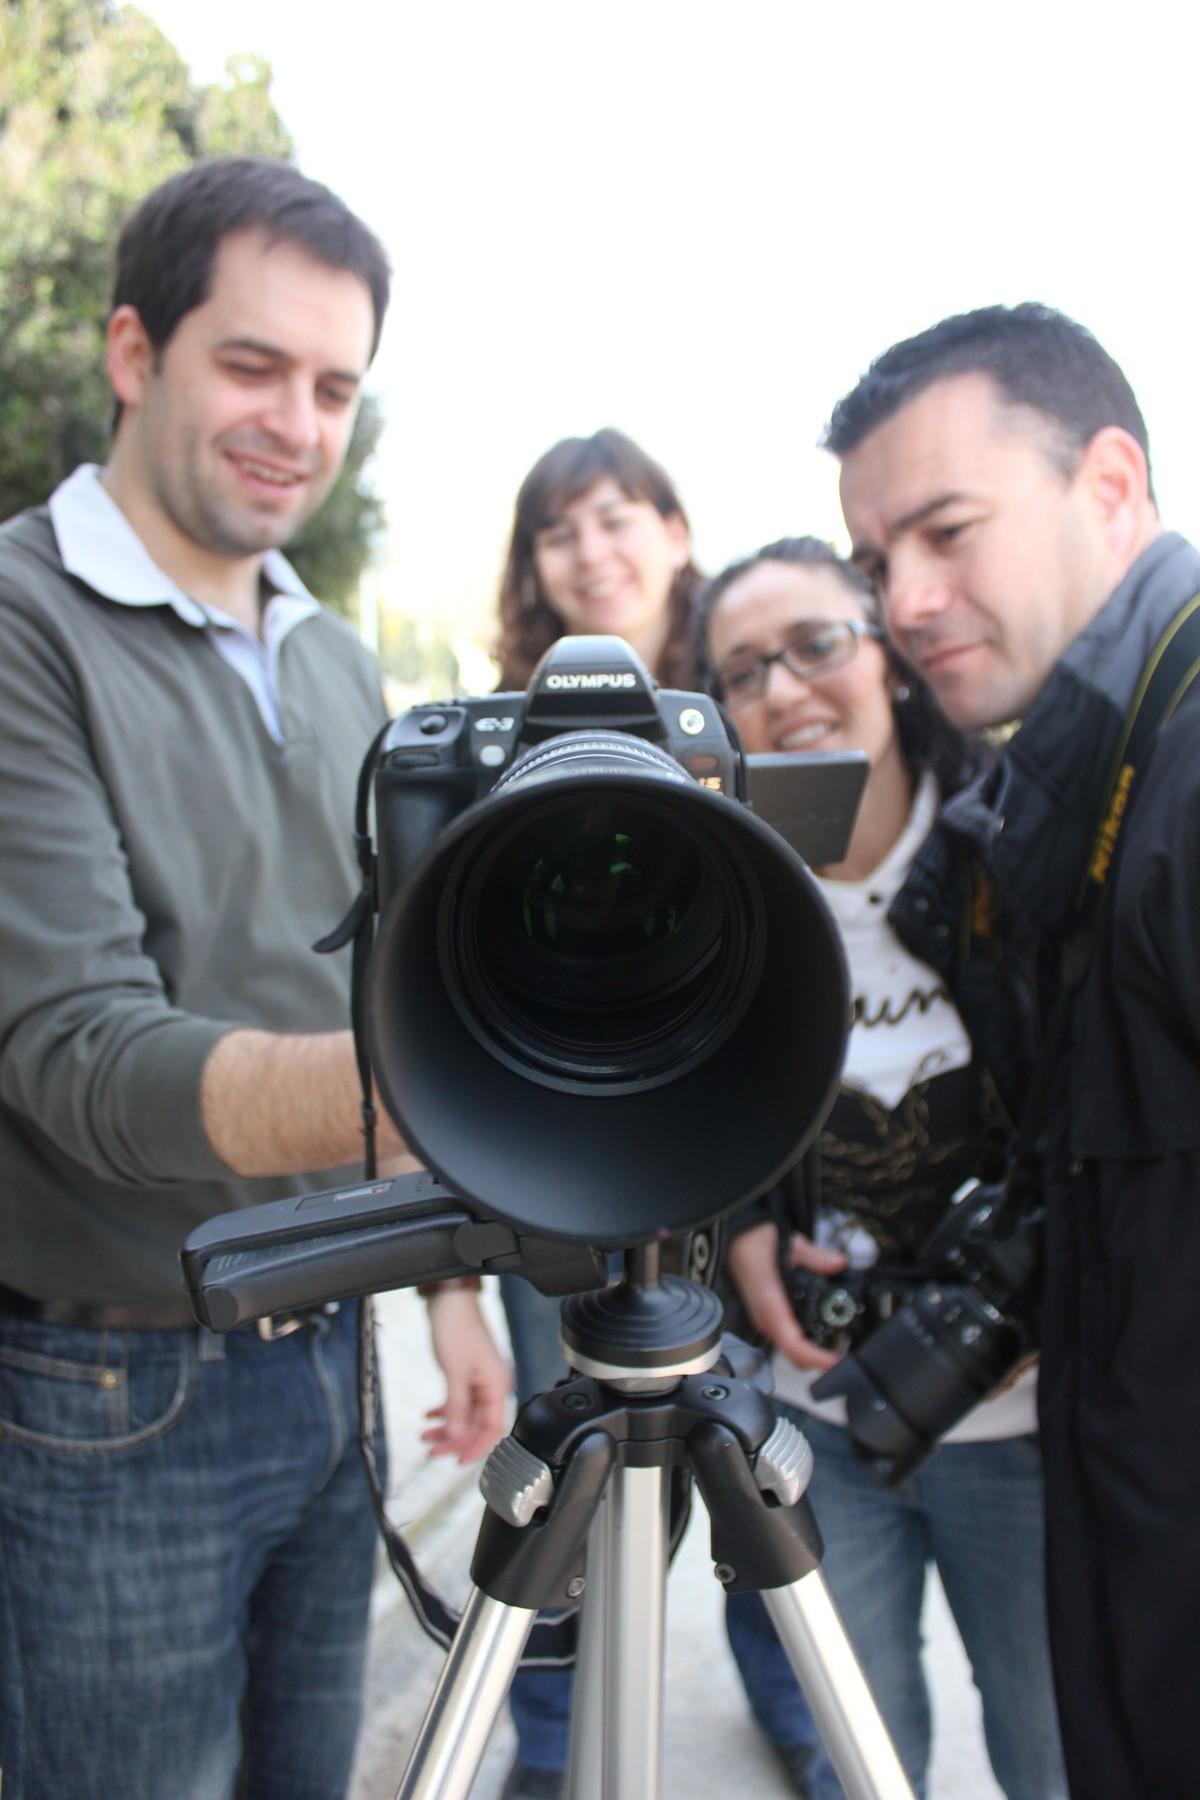 Imagem capa - Cursos de fotografia en Gandia por Sergi Escriva Fotografia